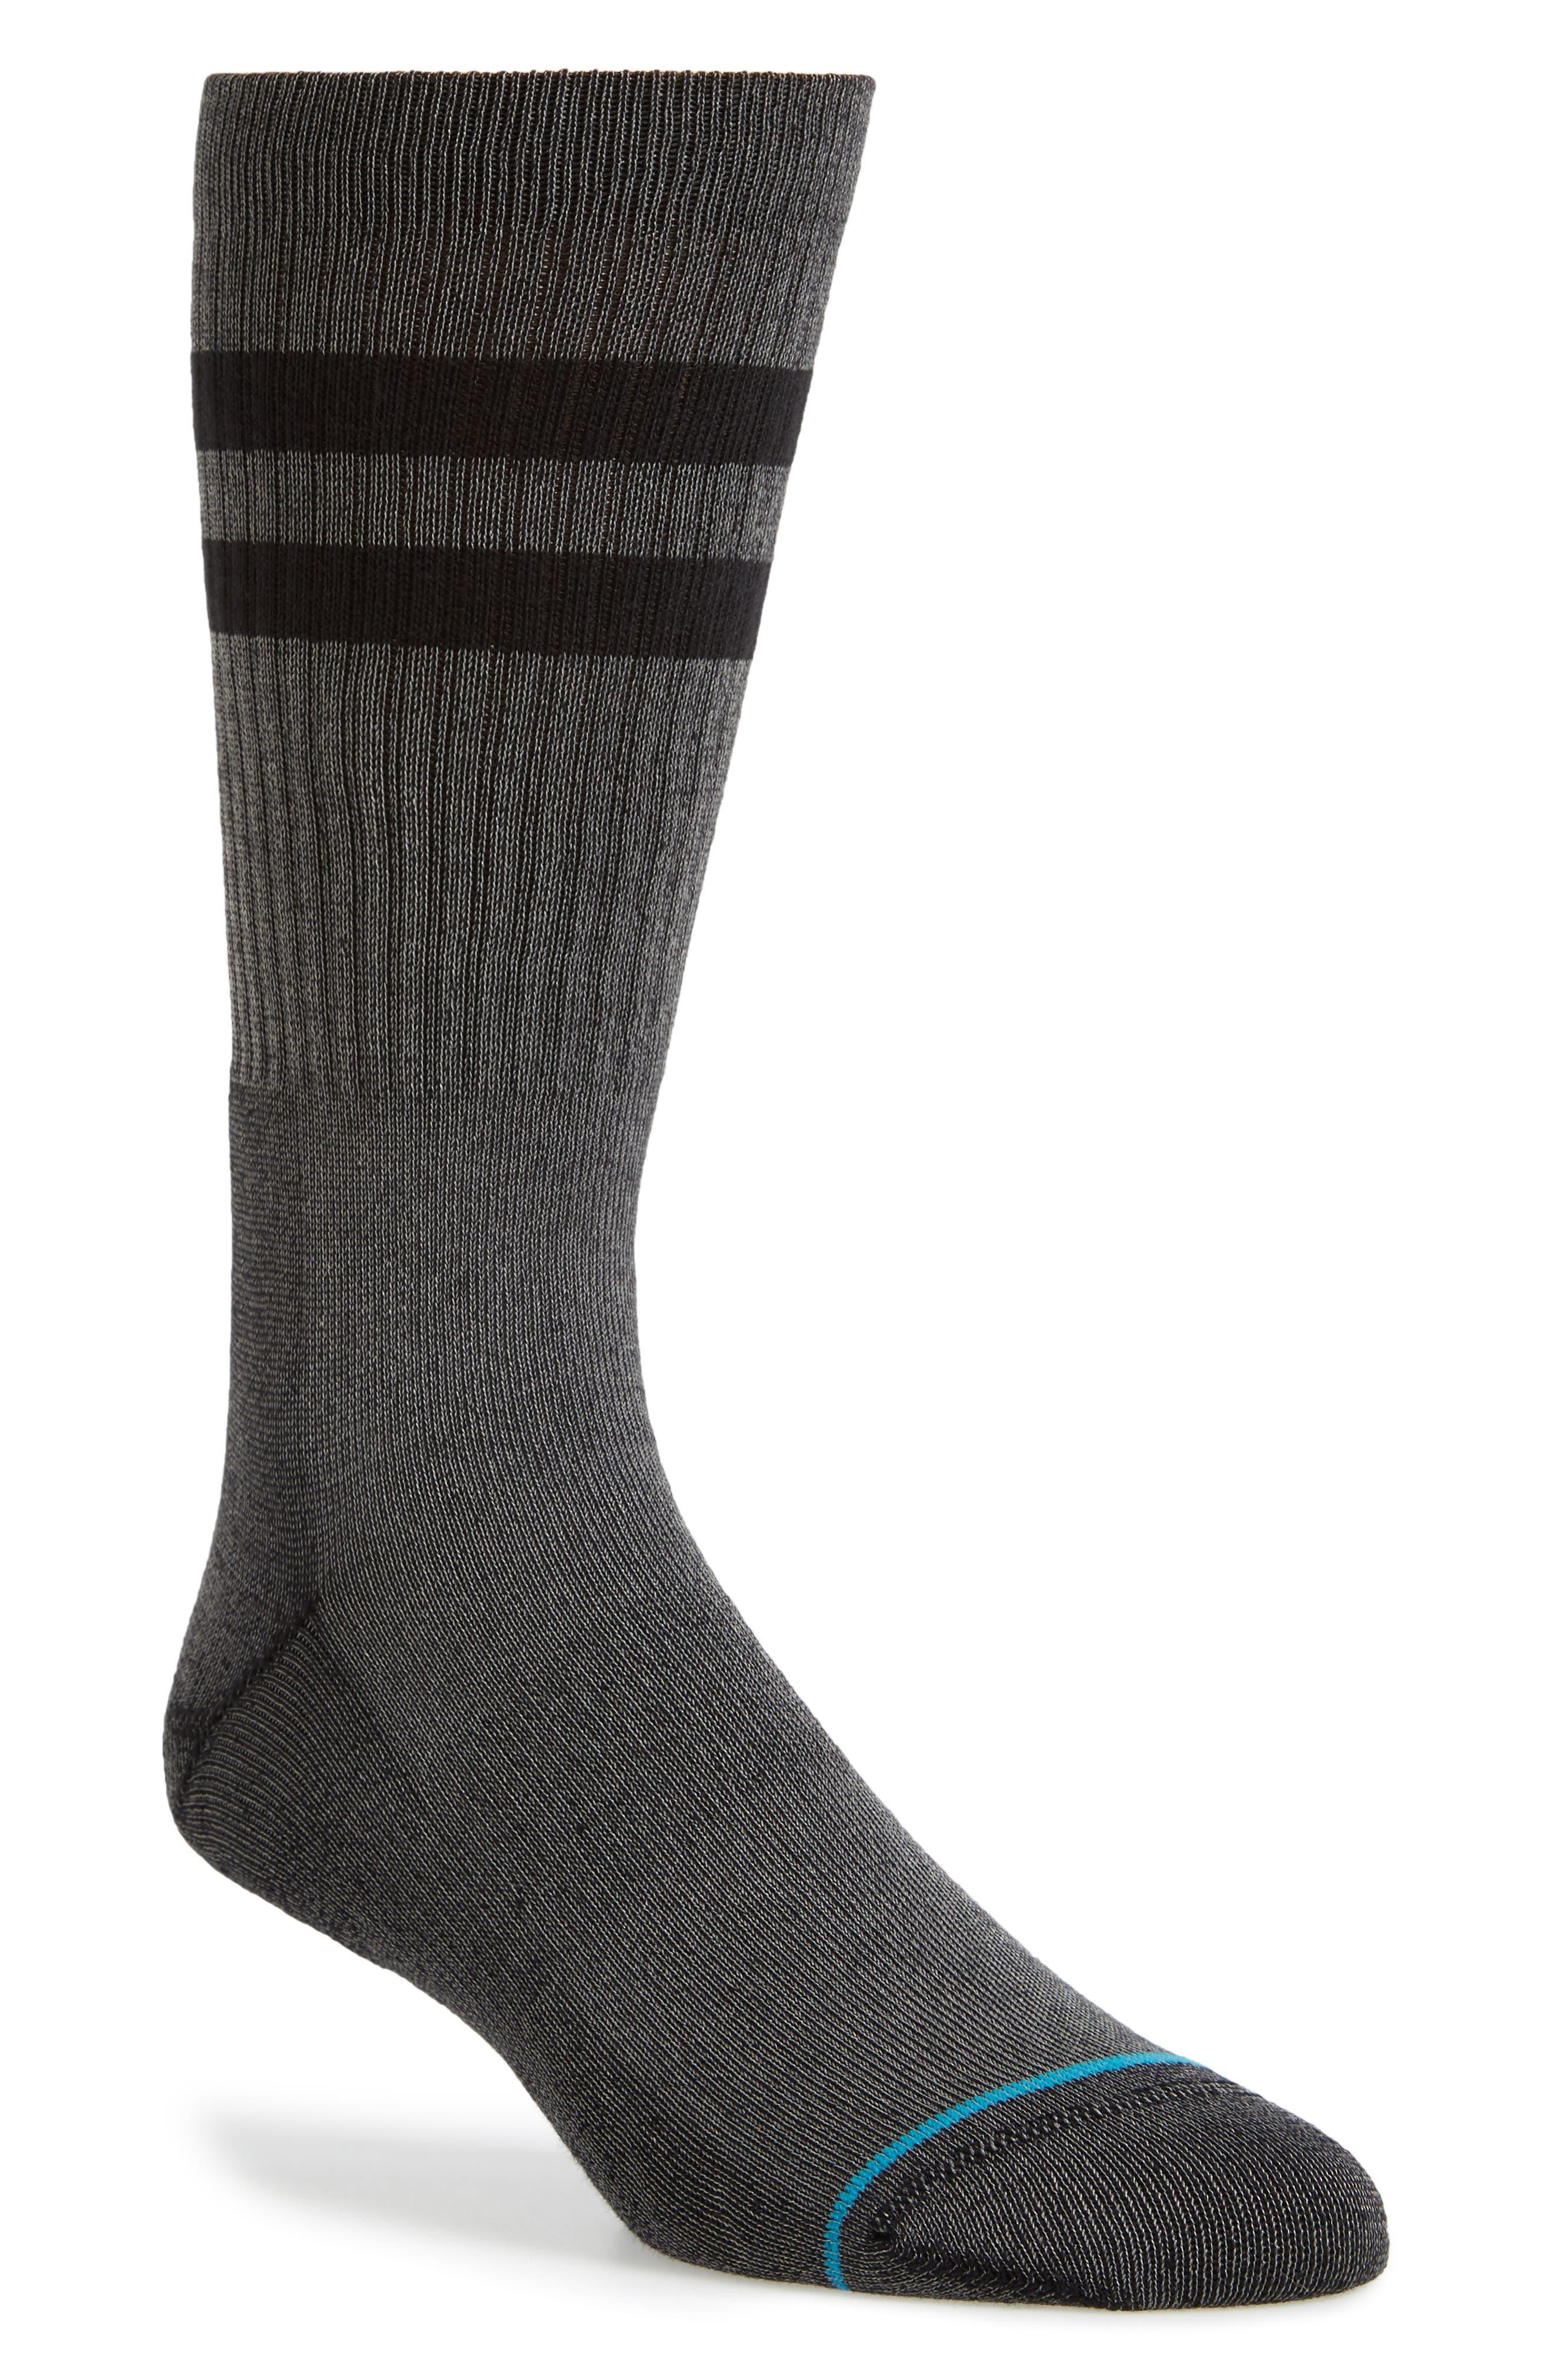 STANCE, Joven Classic Crew Socks, Main thumbnail 1, color, BLACK